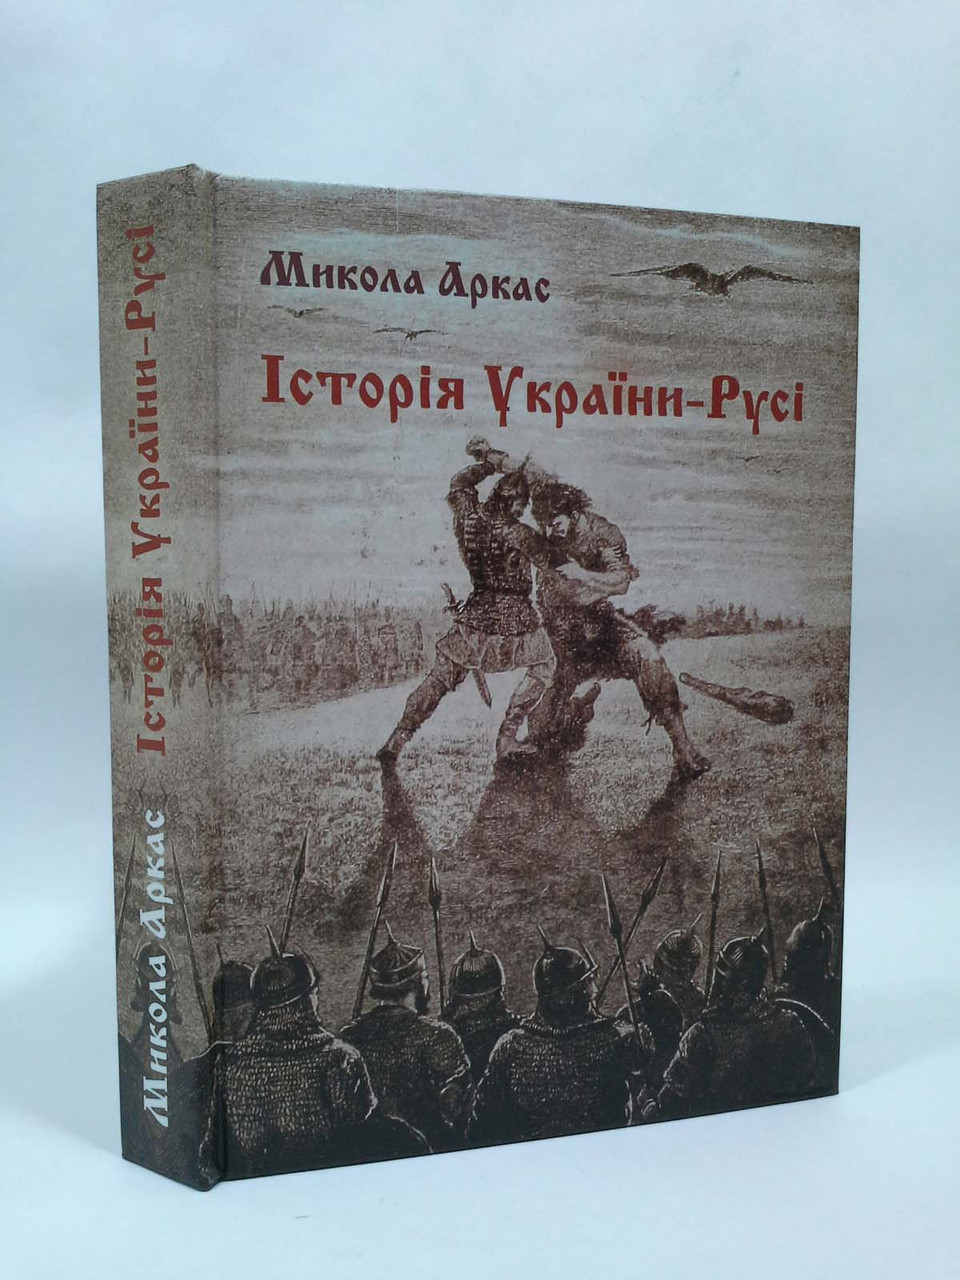 Наш формат Аркас Історія України Русі